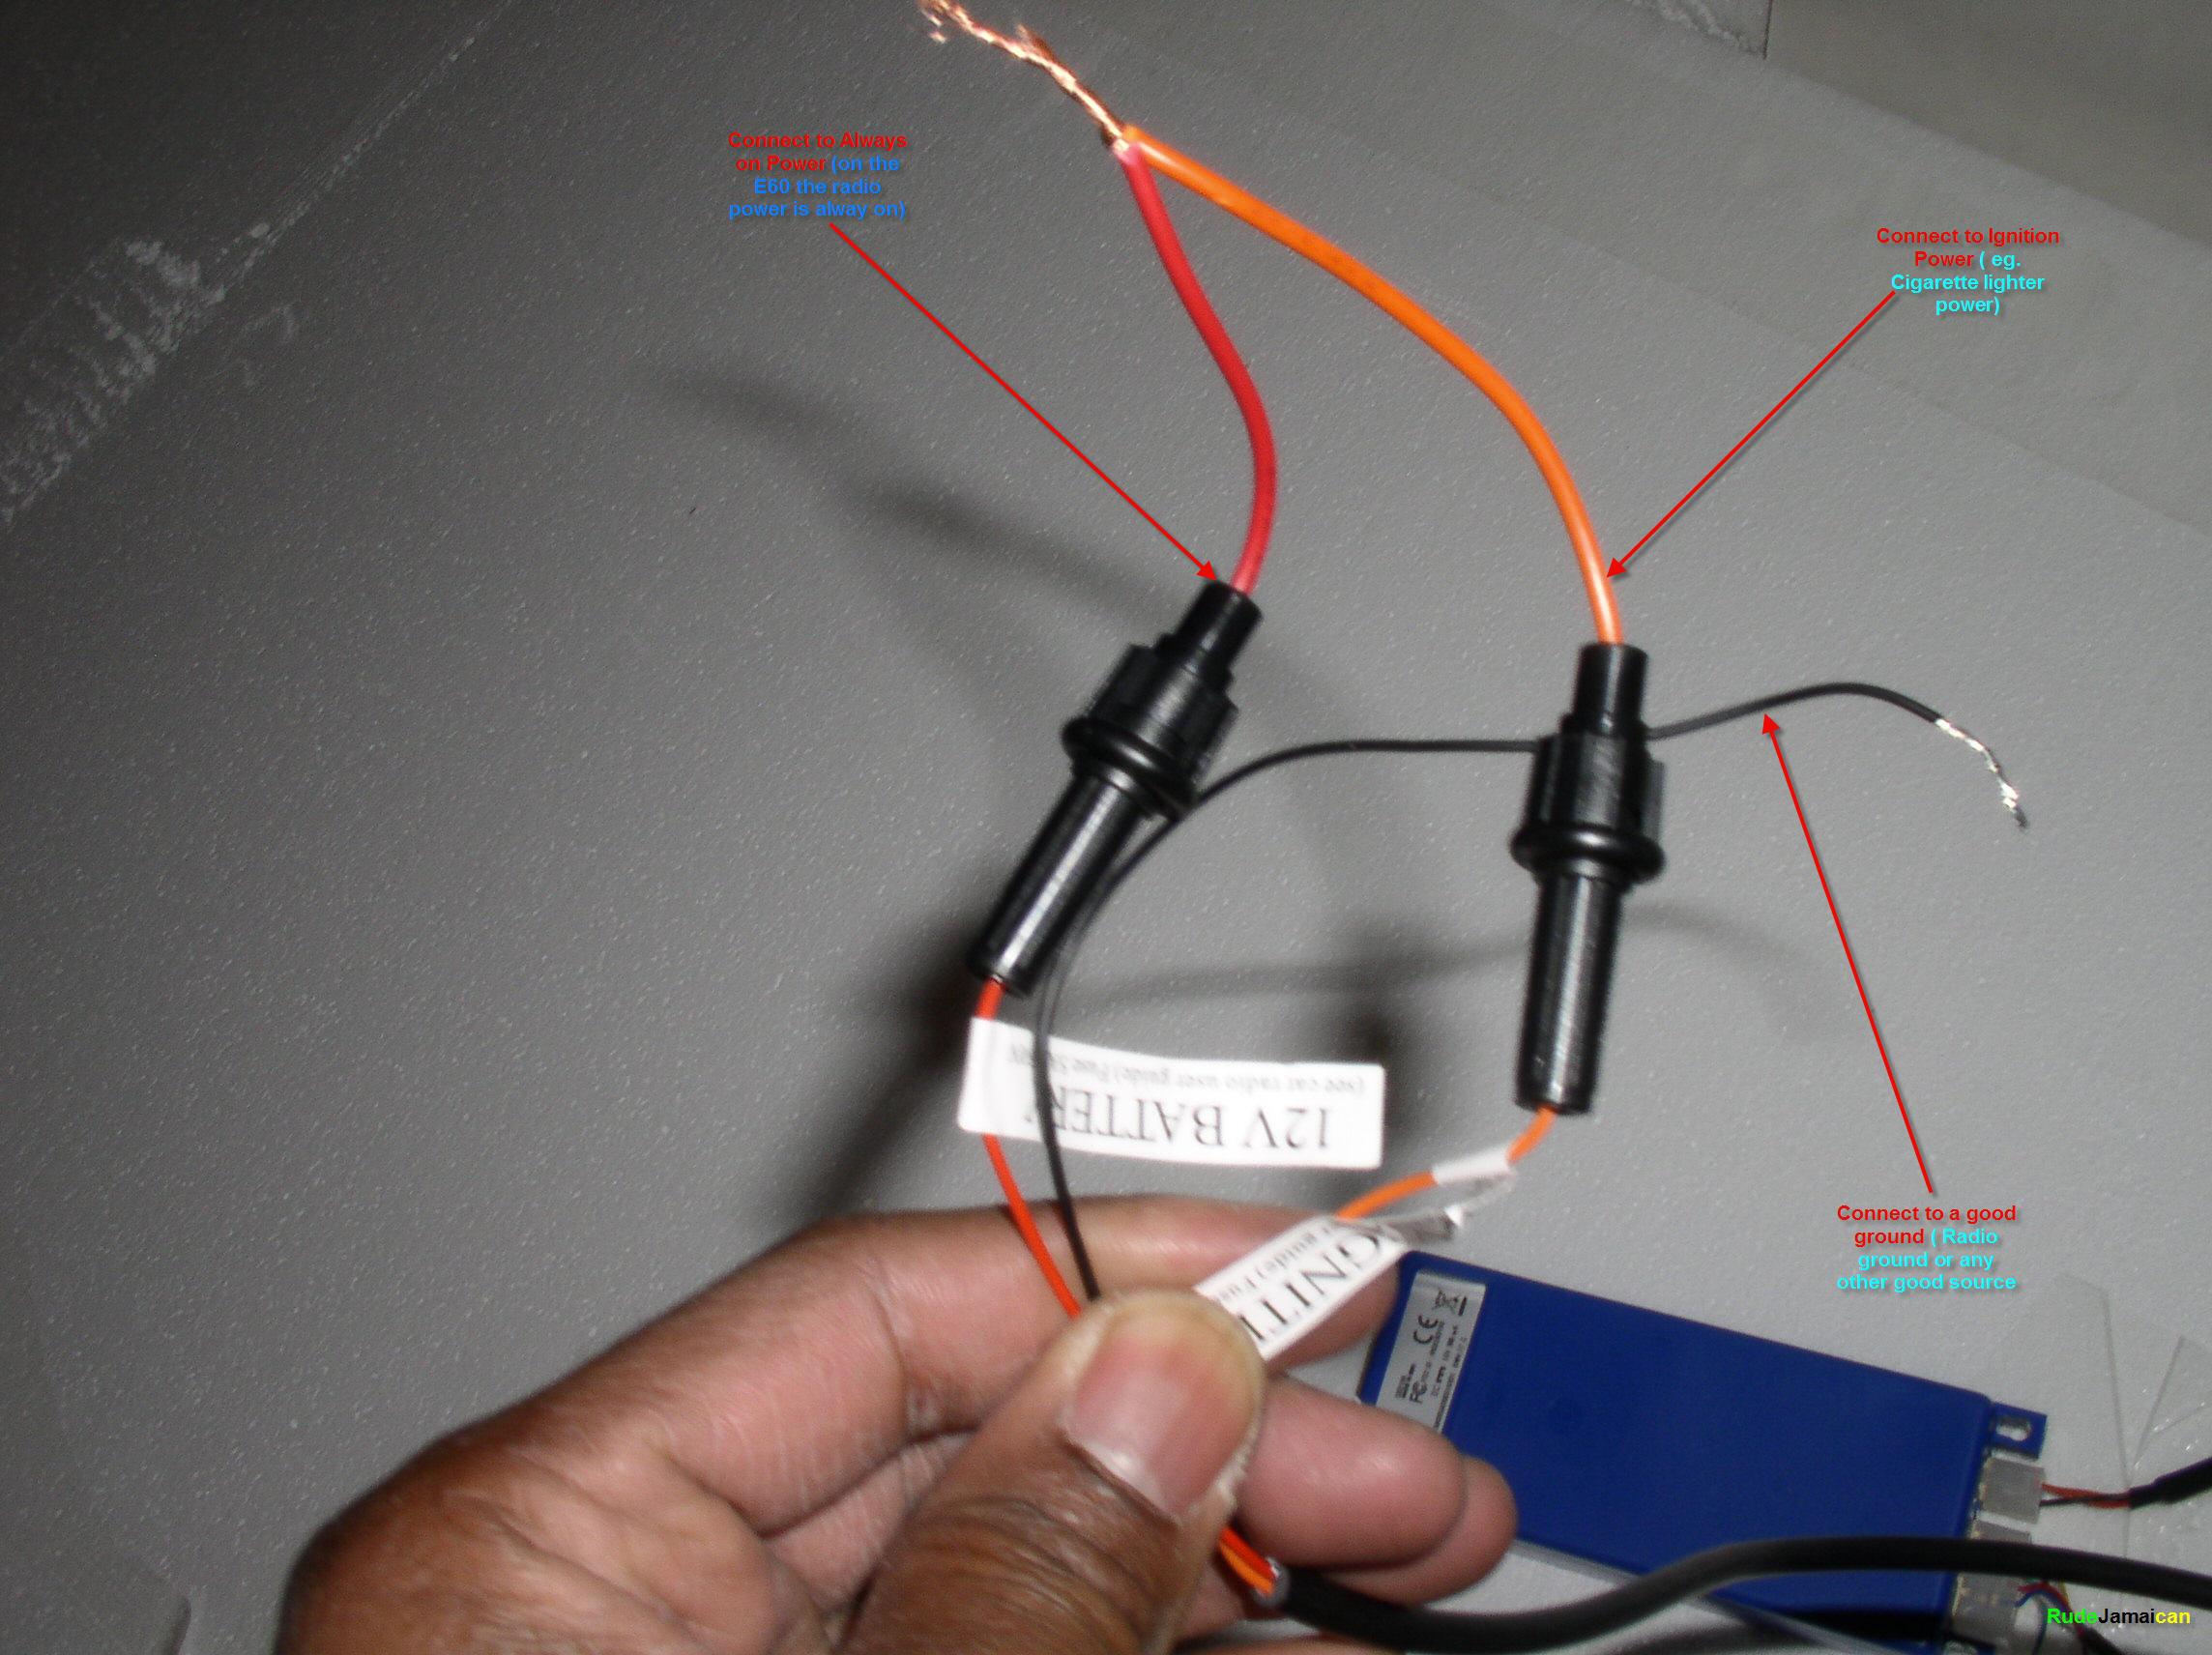 [SCHEMATICS_4FD]  ZY_2465] Parrot Ck3100 Wiring Diagram Ford Focus Schematic Wiring | Wiring Diagram Parrot Ck3100 |  | Ling Tivexi Mohammedshrine Librar Wiring 101